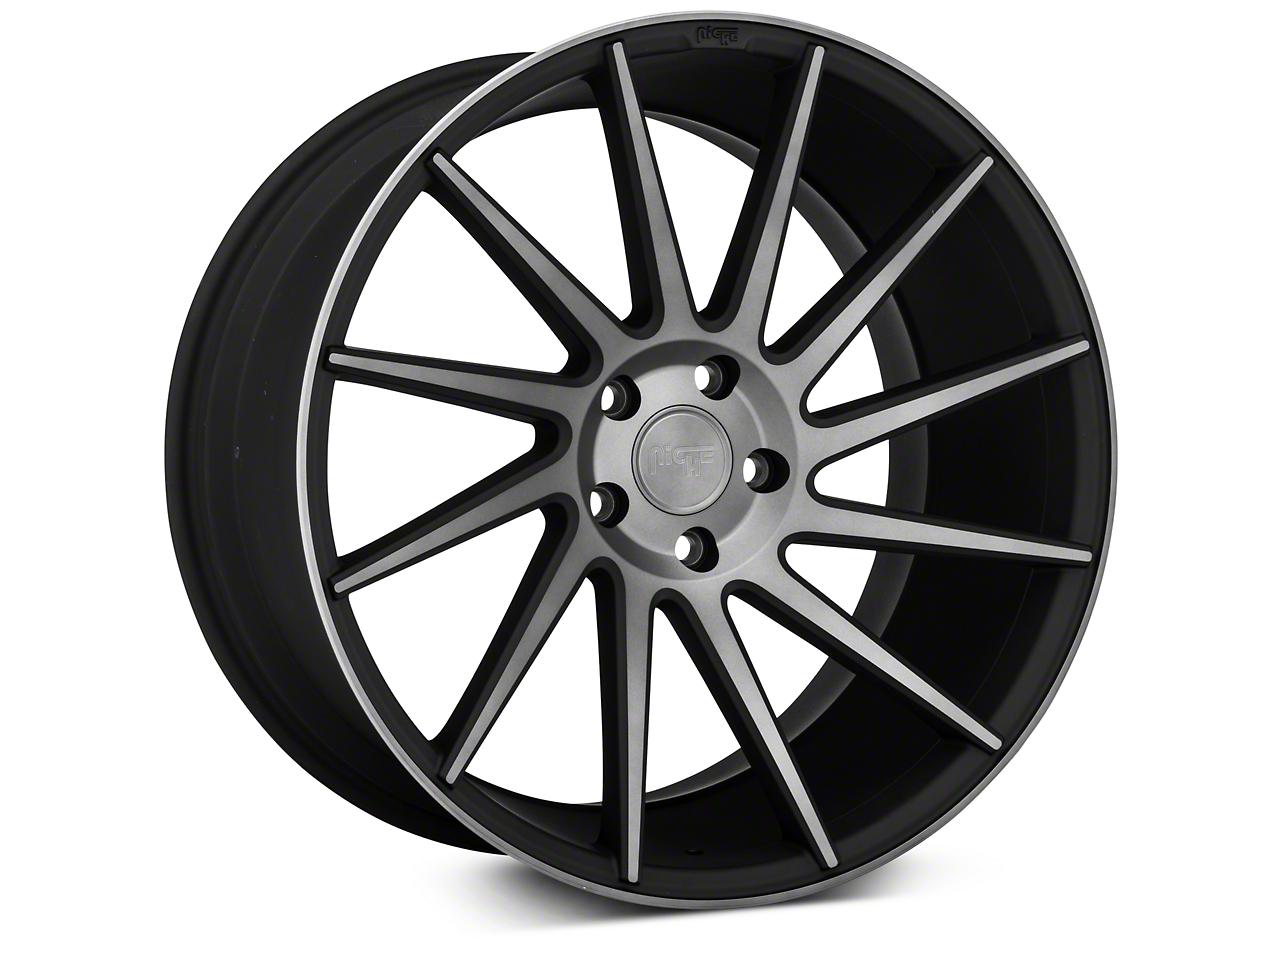 Niche Surge Double Dark Directional Wheel - Passenger Side - 20x10 (05-14 All)